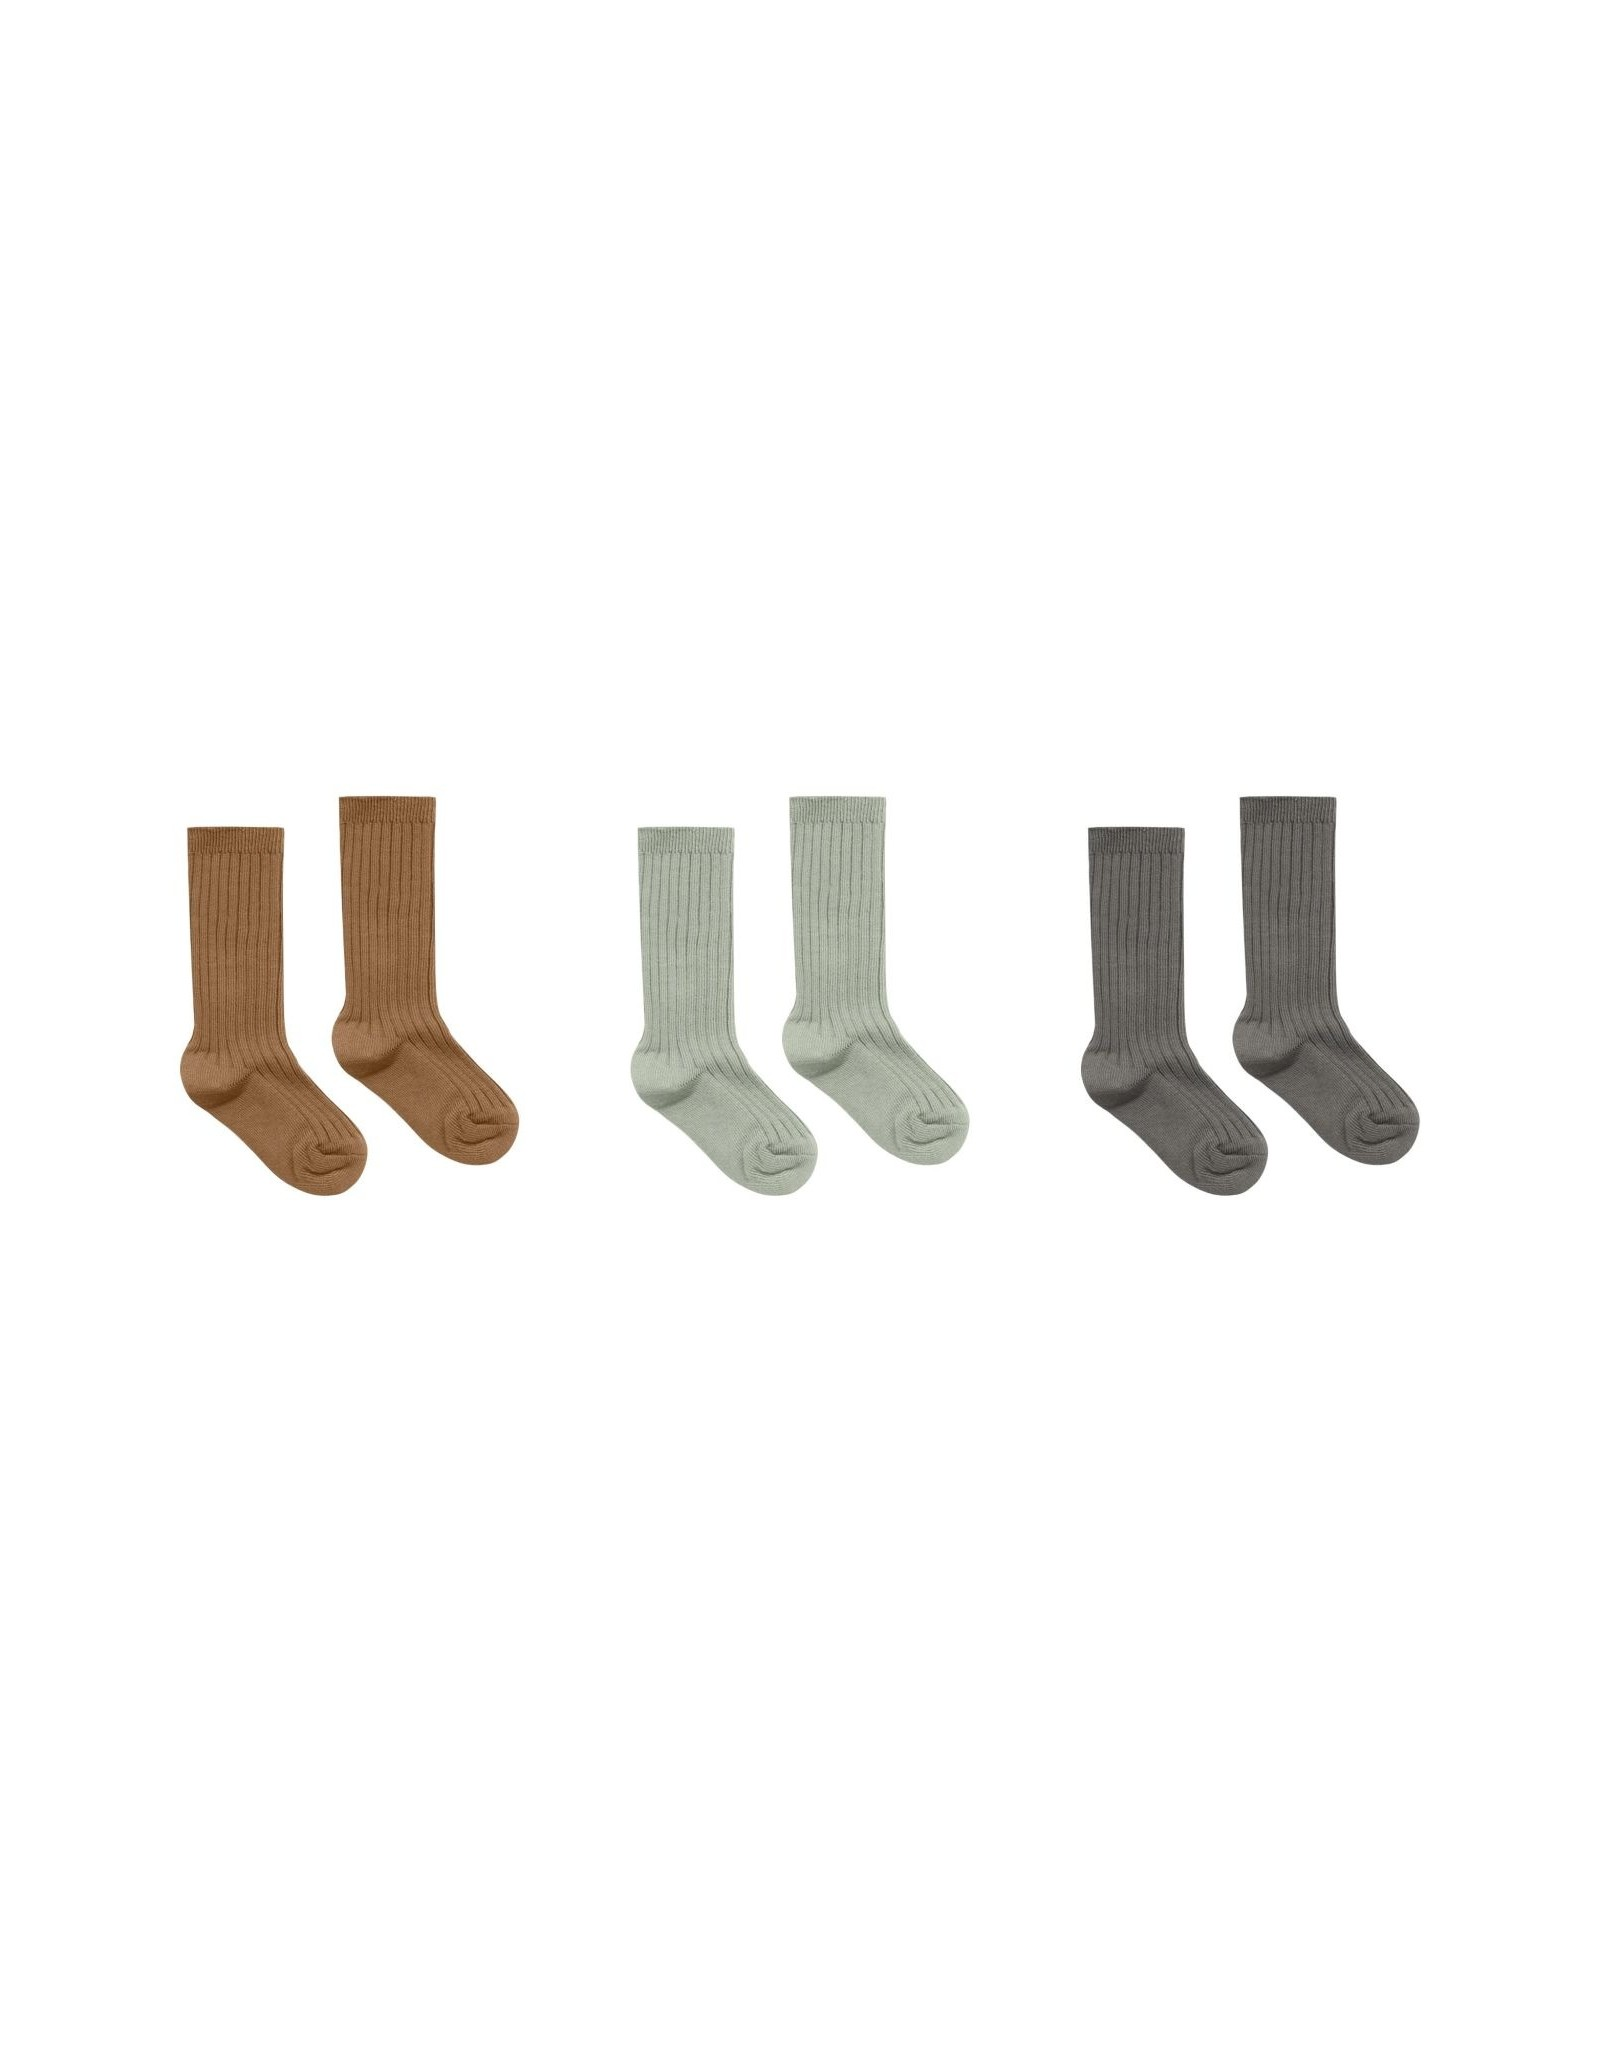 Rylee and Cru ribbed socks- 3 pk